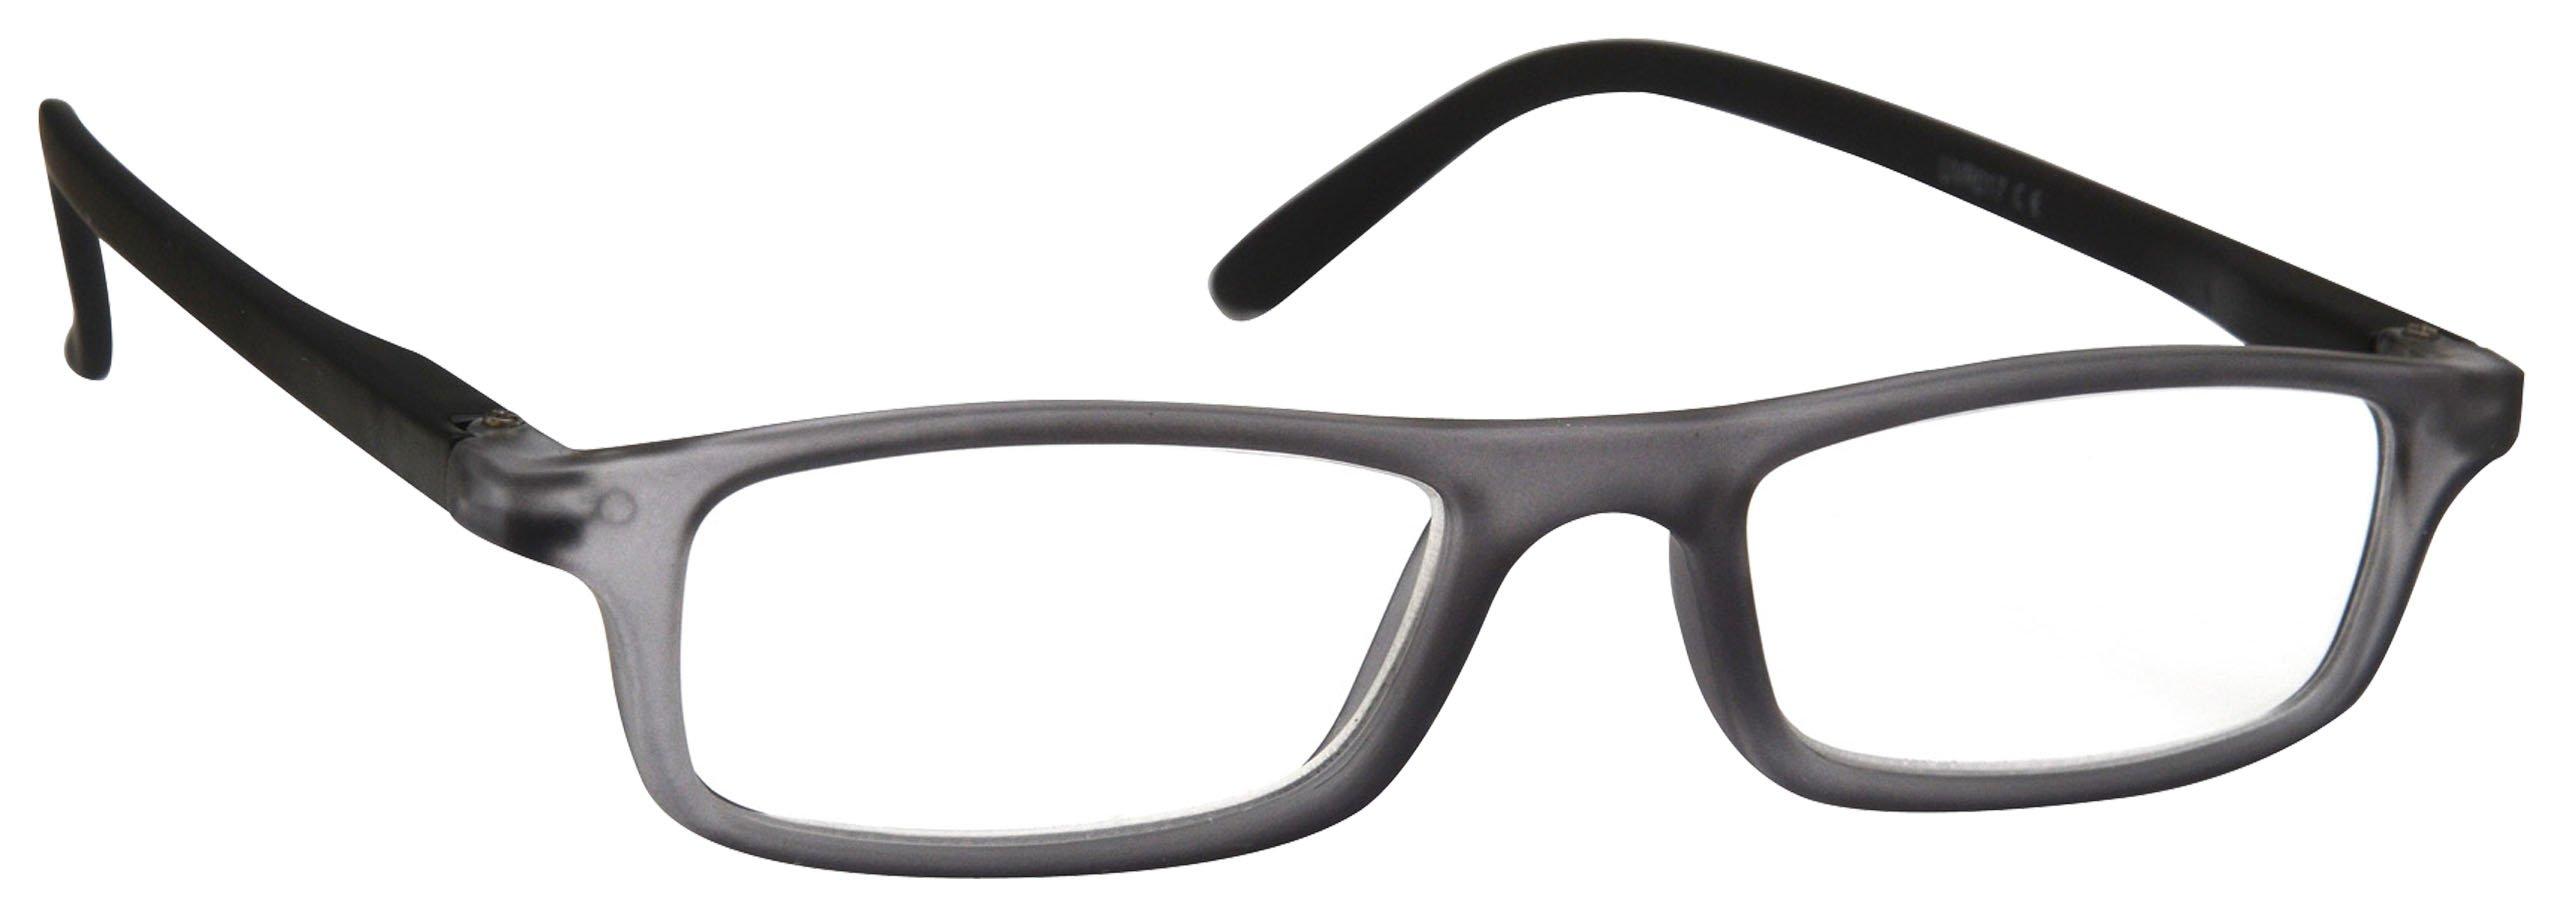 The Reading Glasses Company Matt Grey Black Lightweight Readers Designer Style Mens Womens R17-7 +1.00